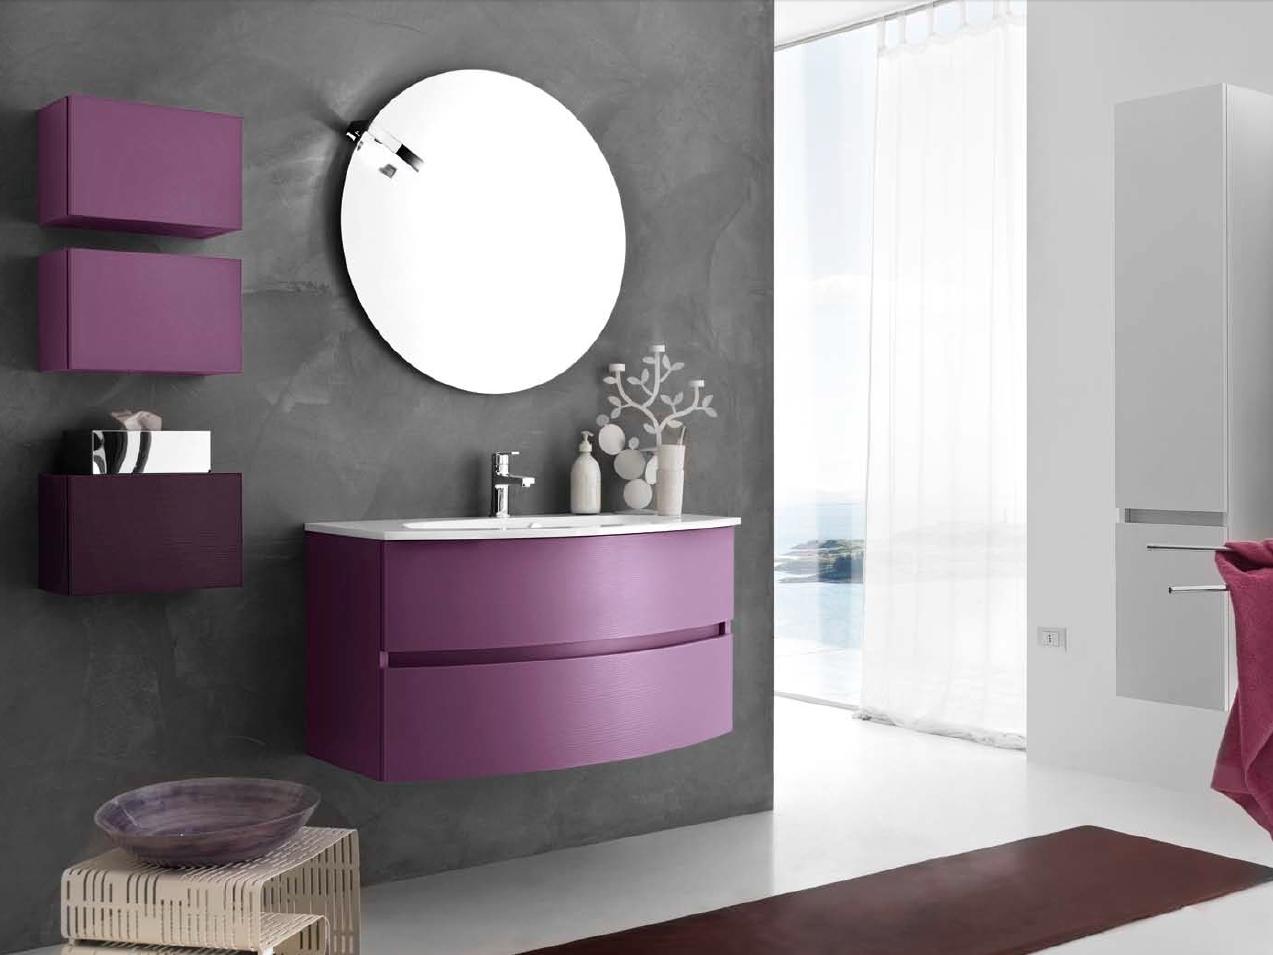 комплект мебели с круглым зеркалом